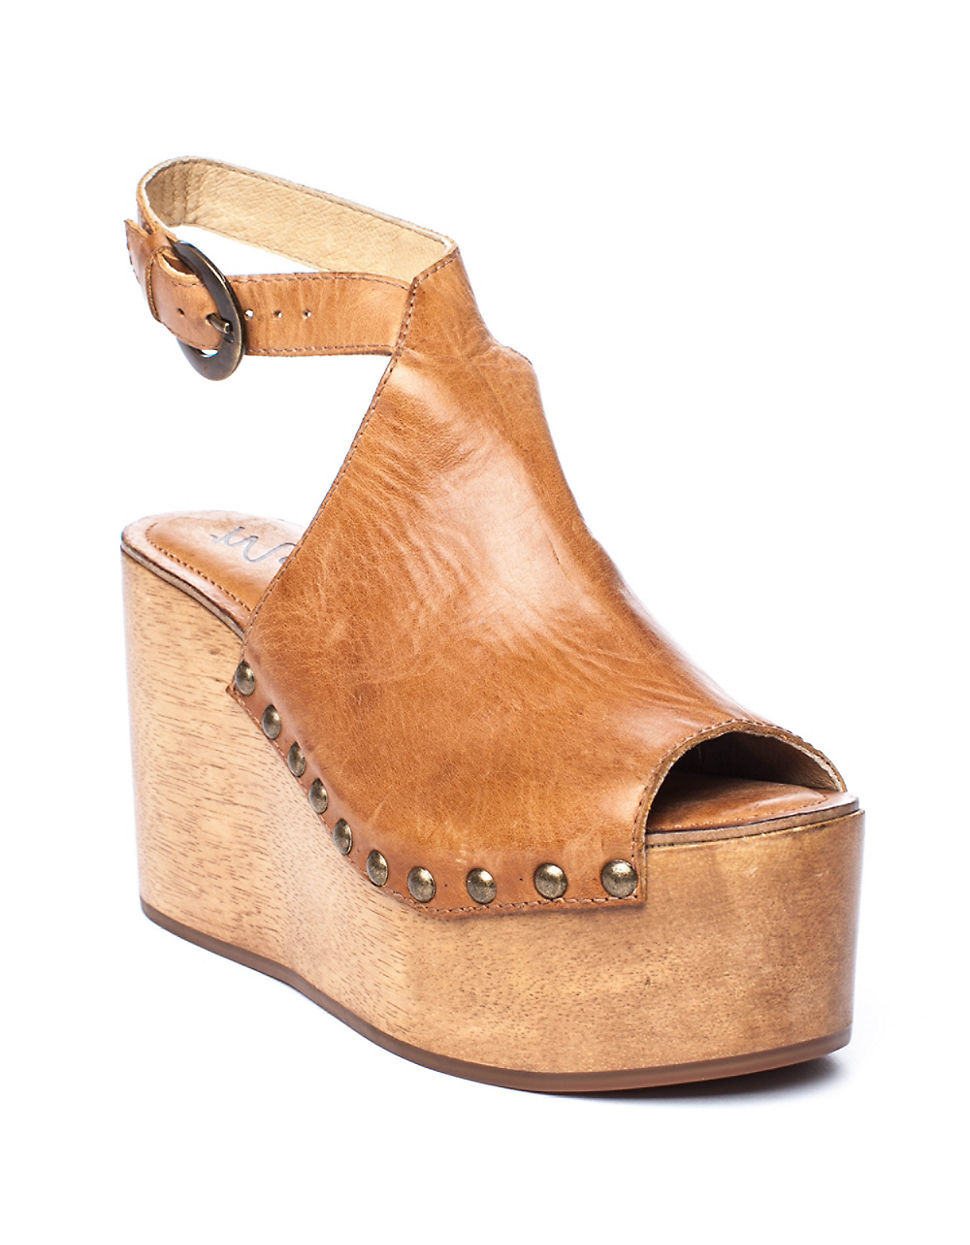 e8dd0d38b60 Matisse Tiegs Leather Platform Sandals in Natural - Lyst